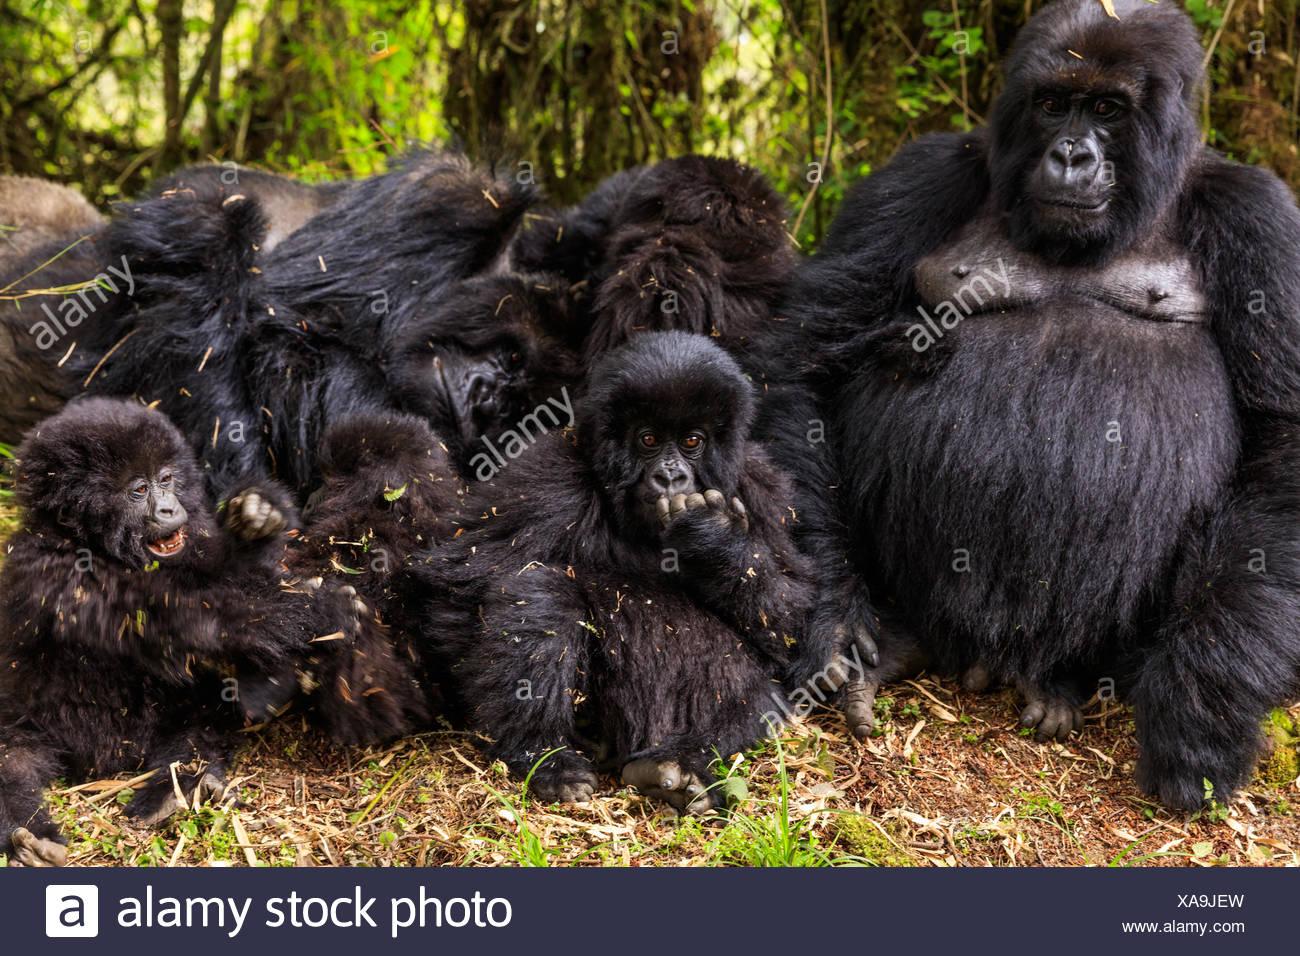 A family of mountain gorillas rests on the slopes of Mount Karisimbi. - Stock Image